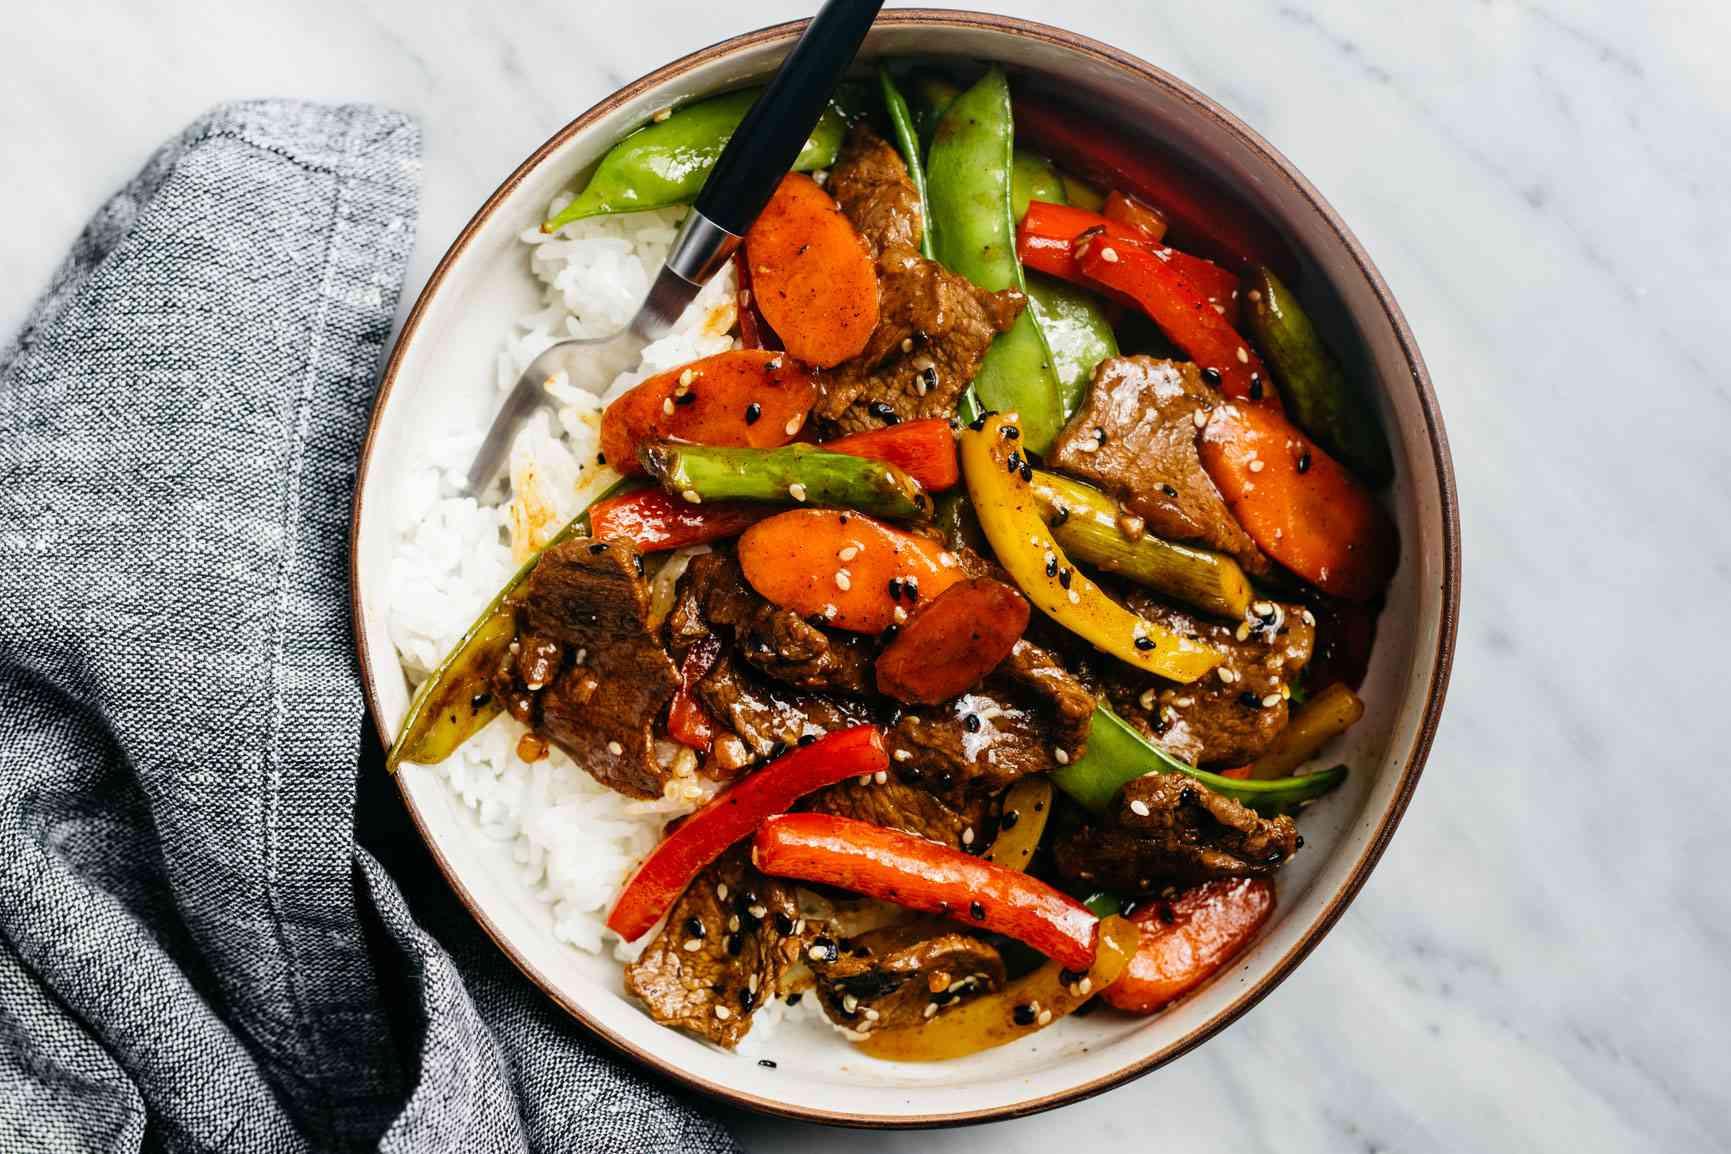 Sweet and Sour Steak Stir Fry